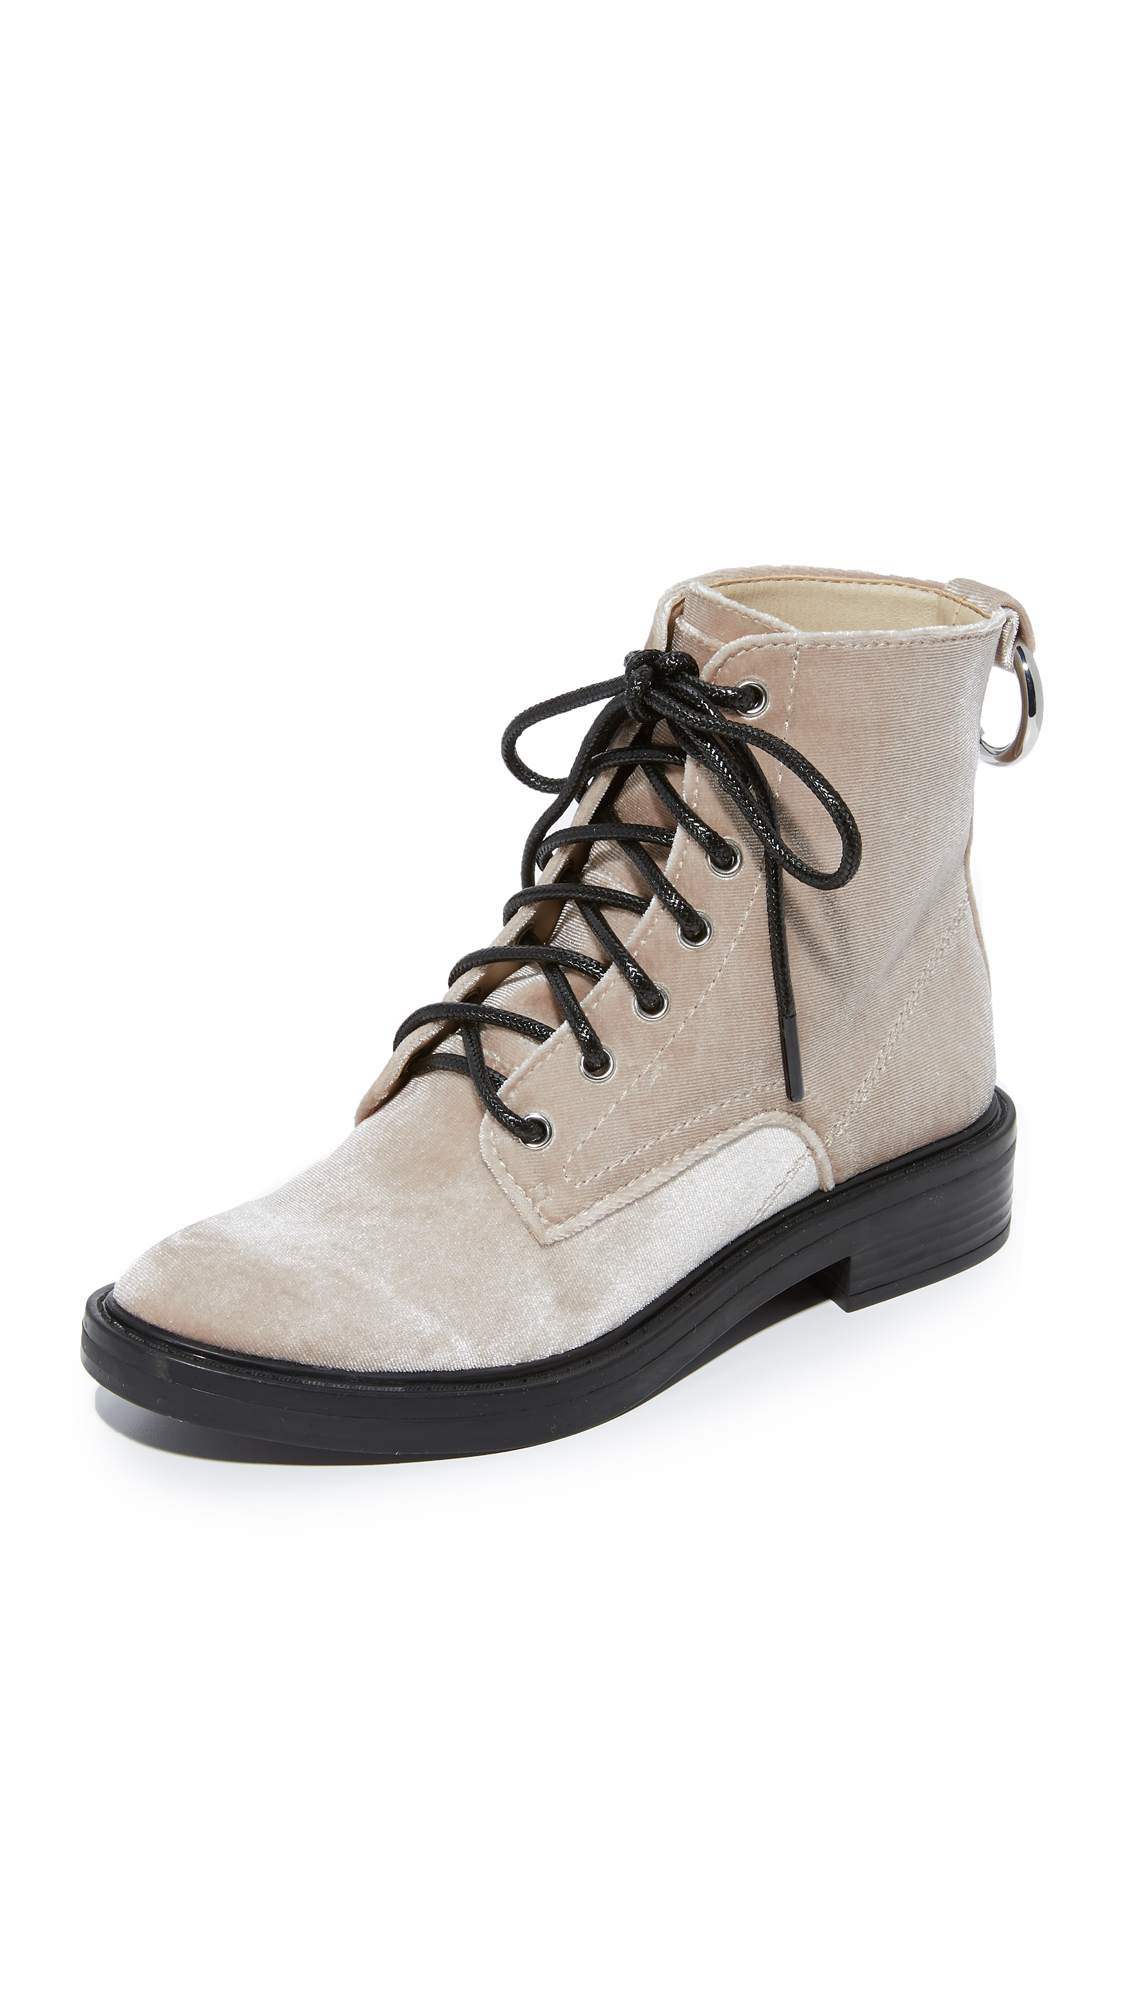 Dolce Vita Bardot Velvet Combat Boots - Silver